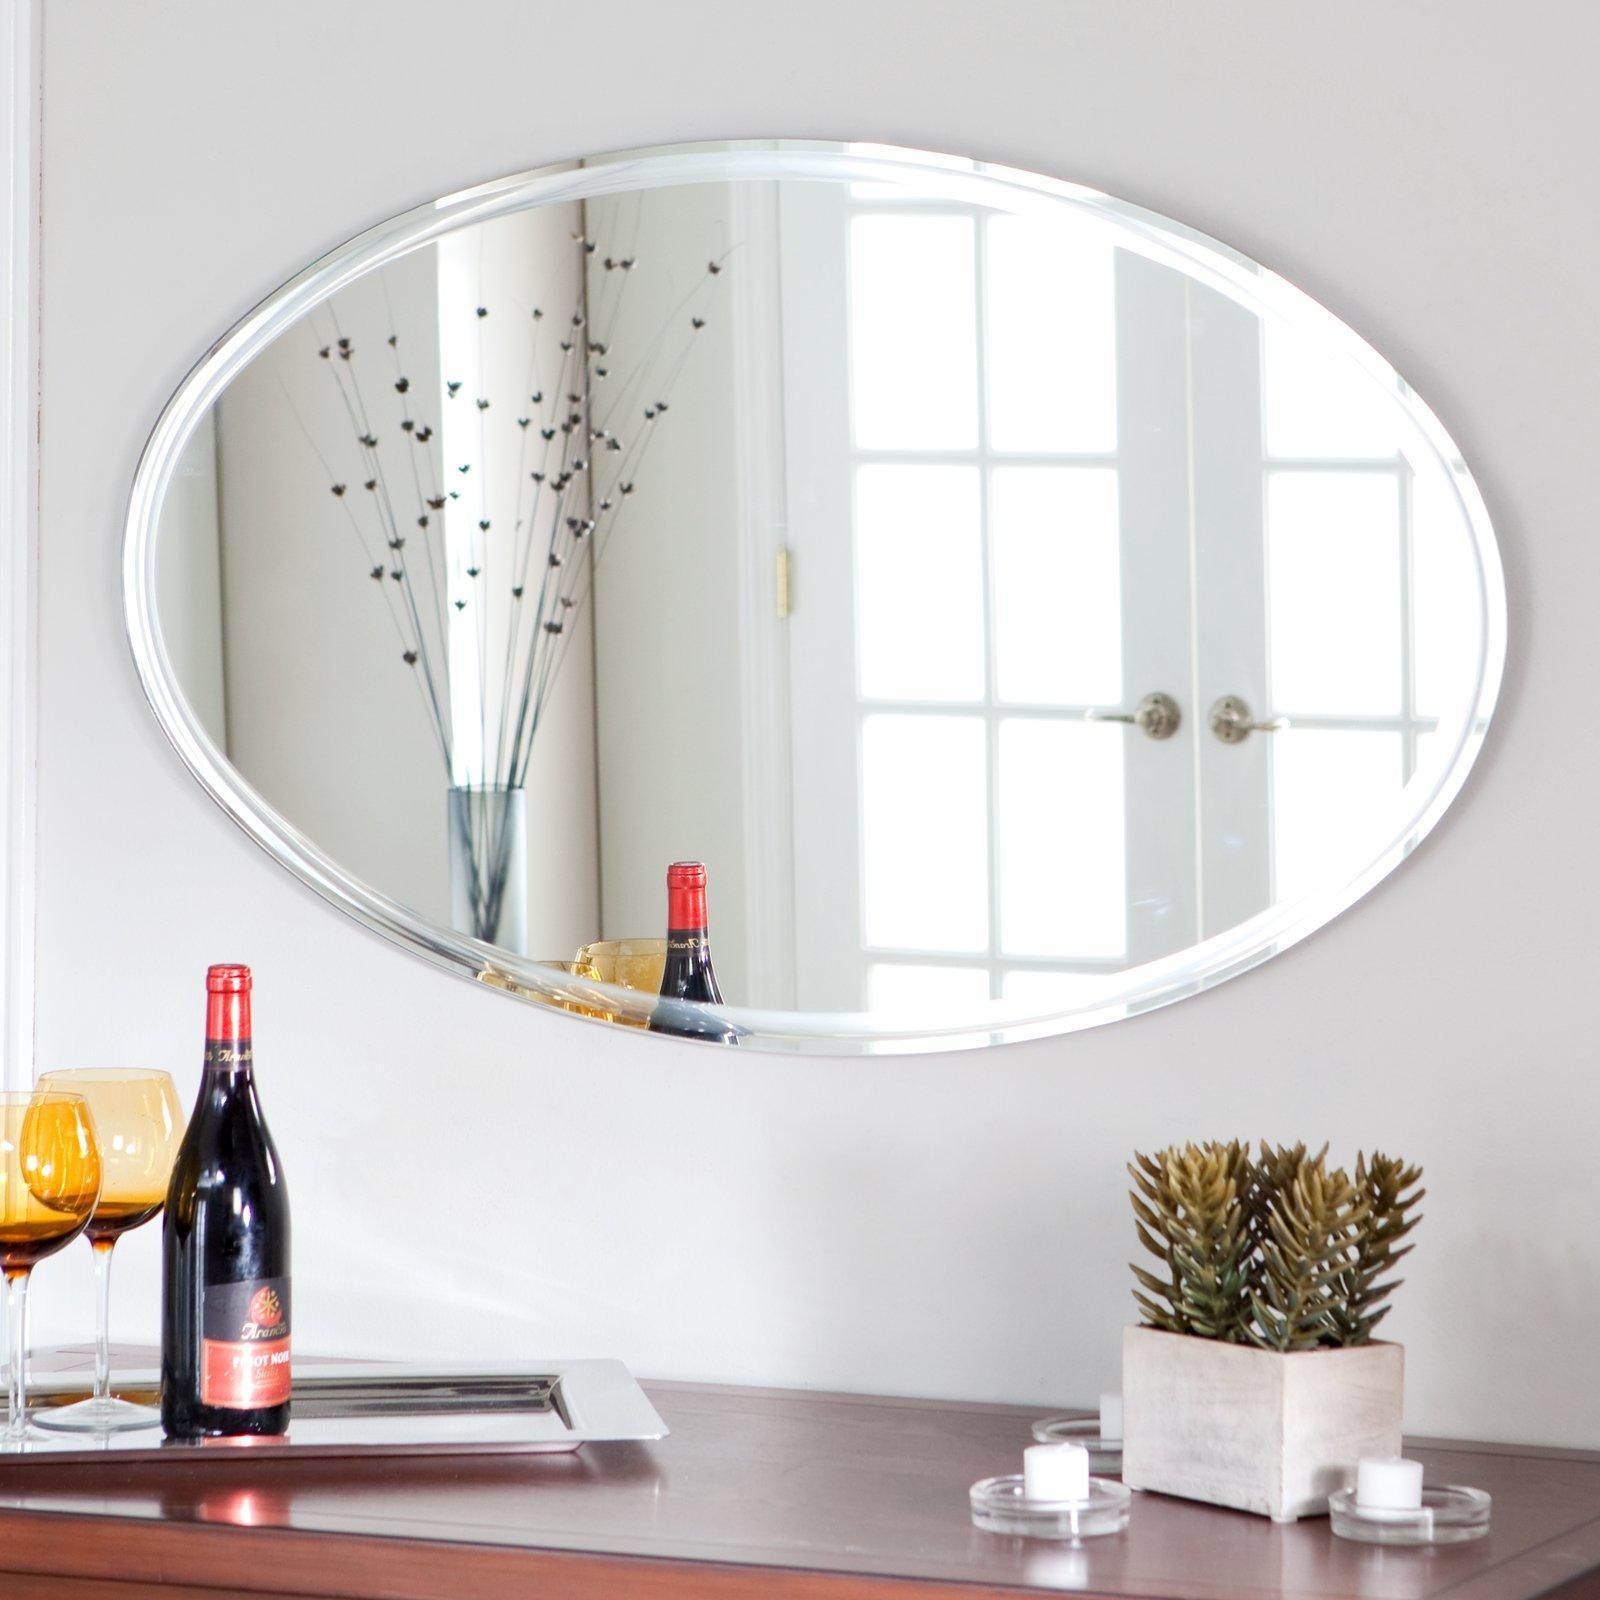 20 Oval Shaped Wall Mirrors  Mirror Ideas